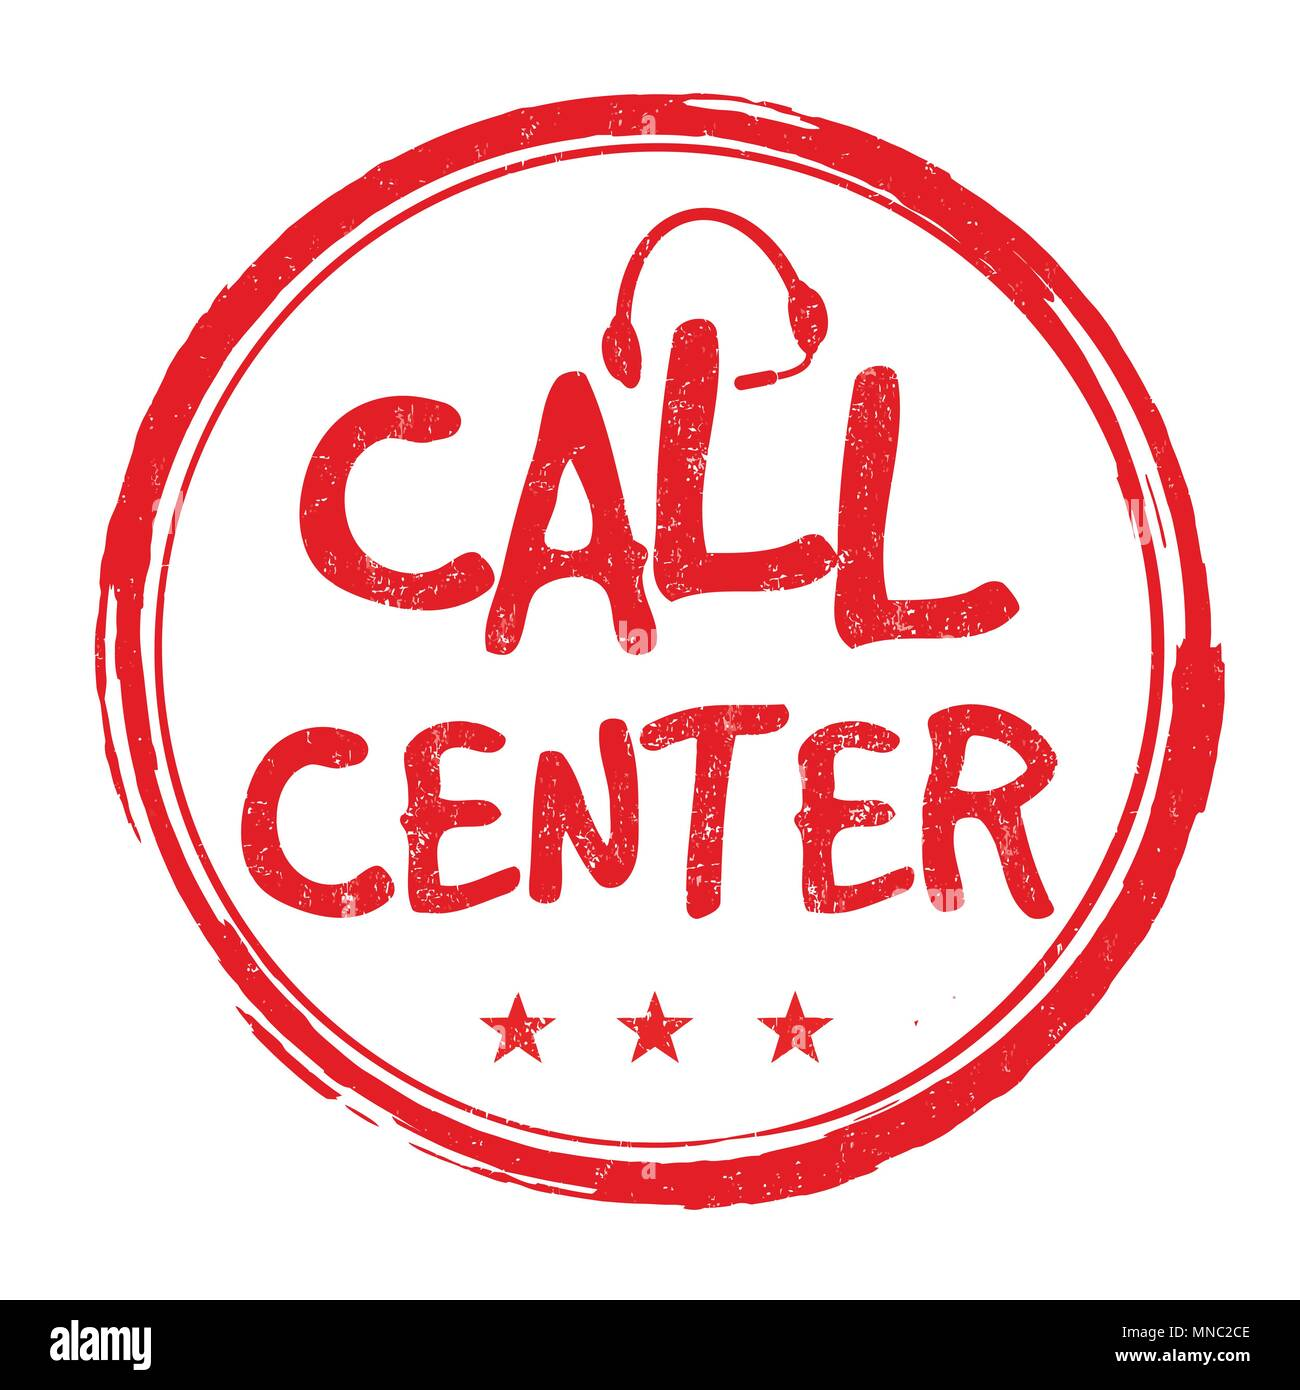 Call center grunge rubber stamp on white background, vector illustration Stock Vector